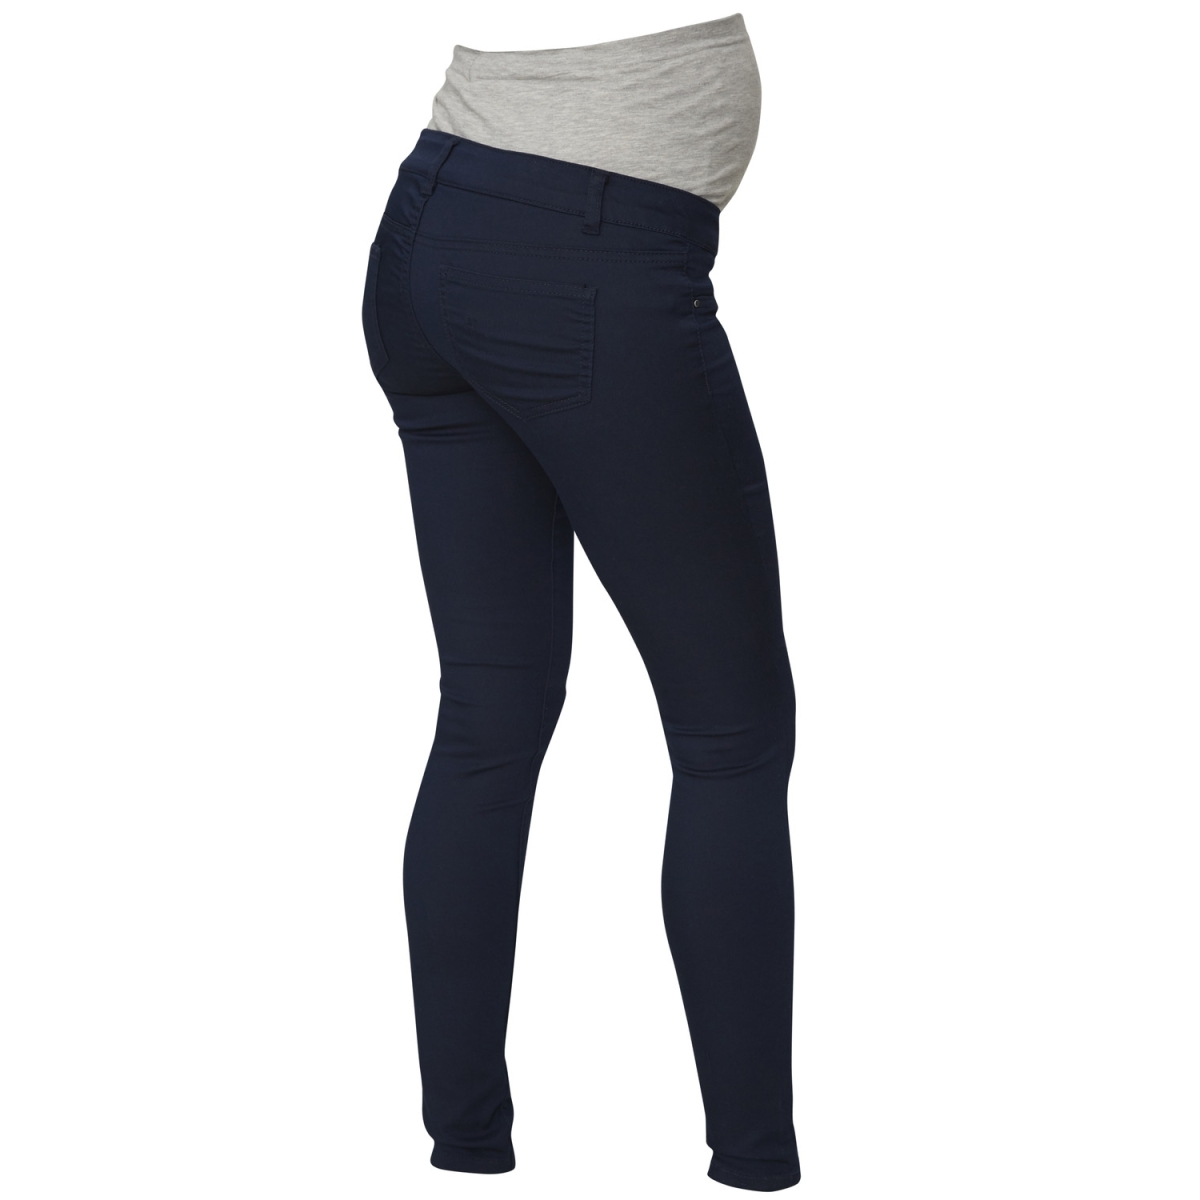 mlelly skinny color jeans 20006799 mama-licious positie broek navy blazer